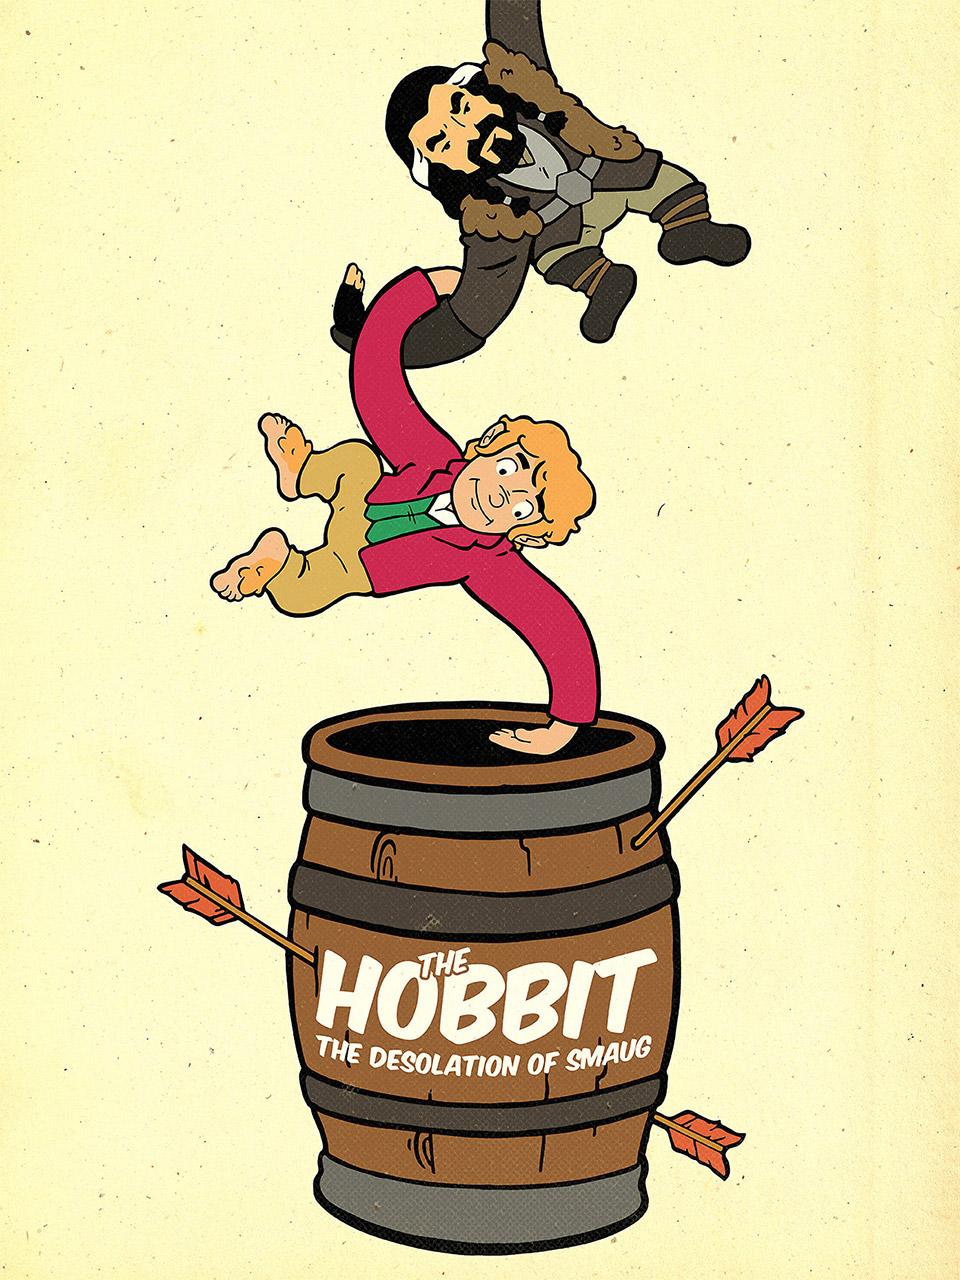 The Hobbit: The Desolation of Smaug Barrel of Monkeys